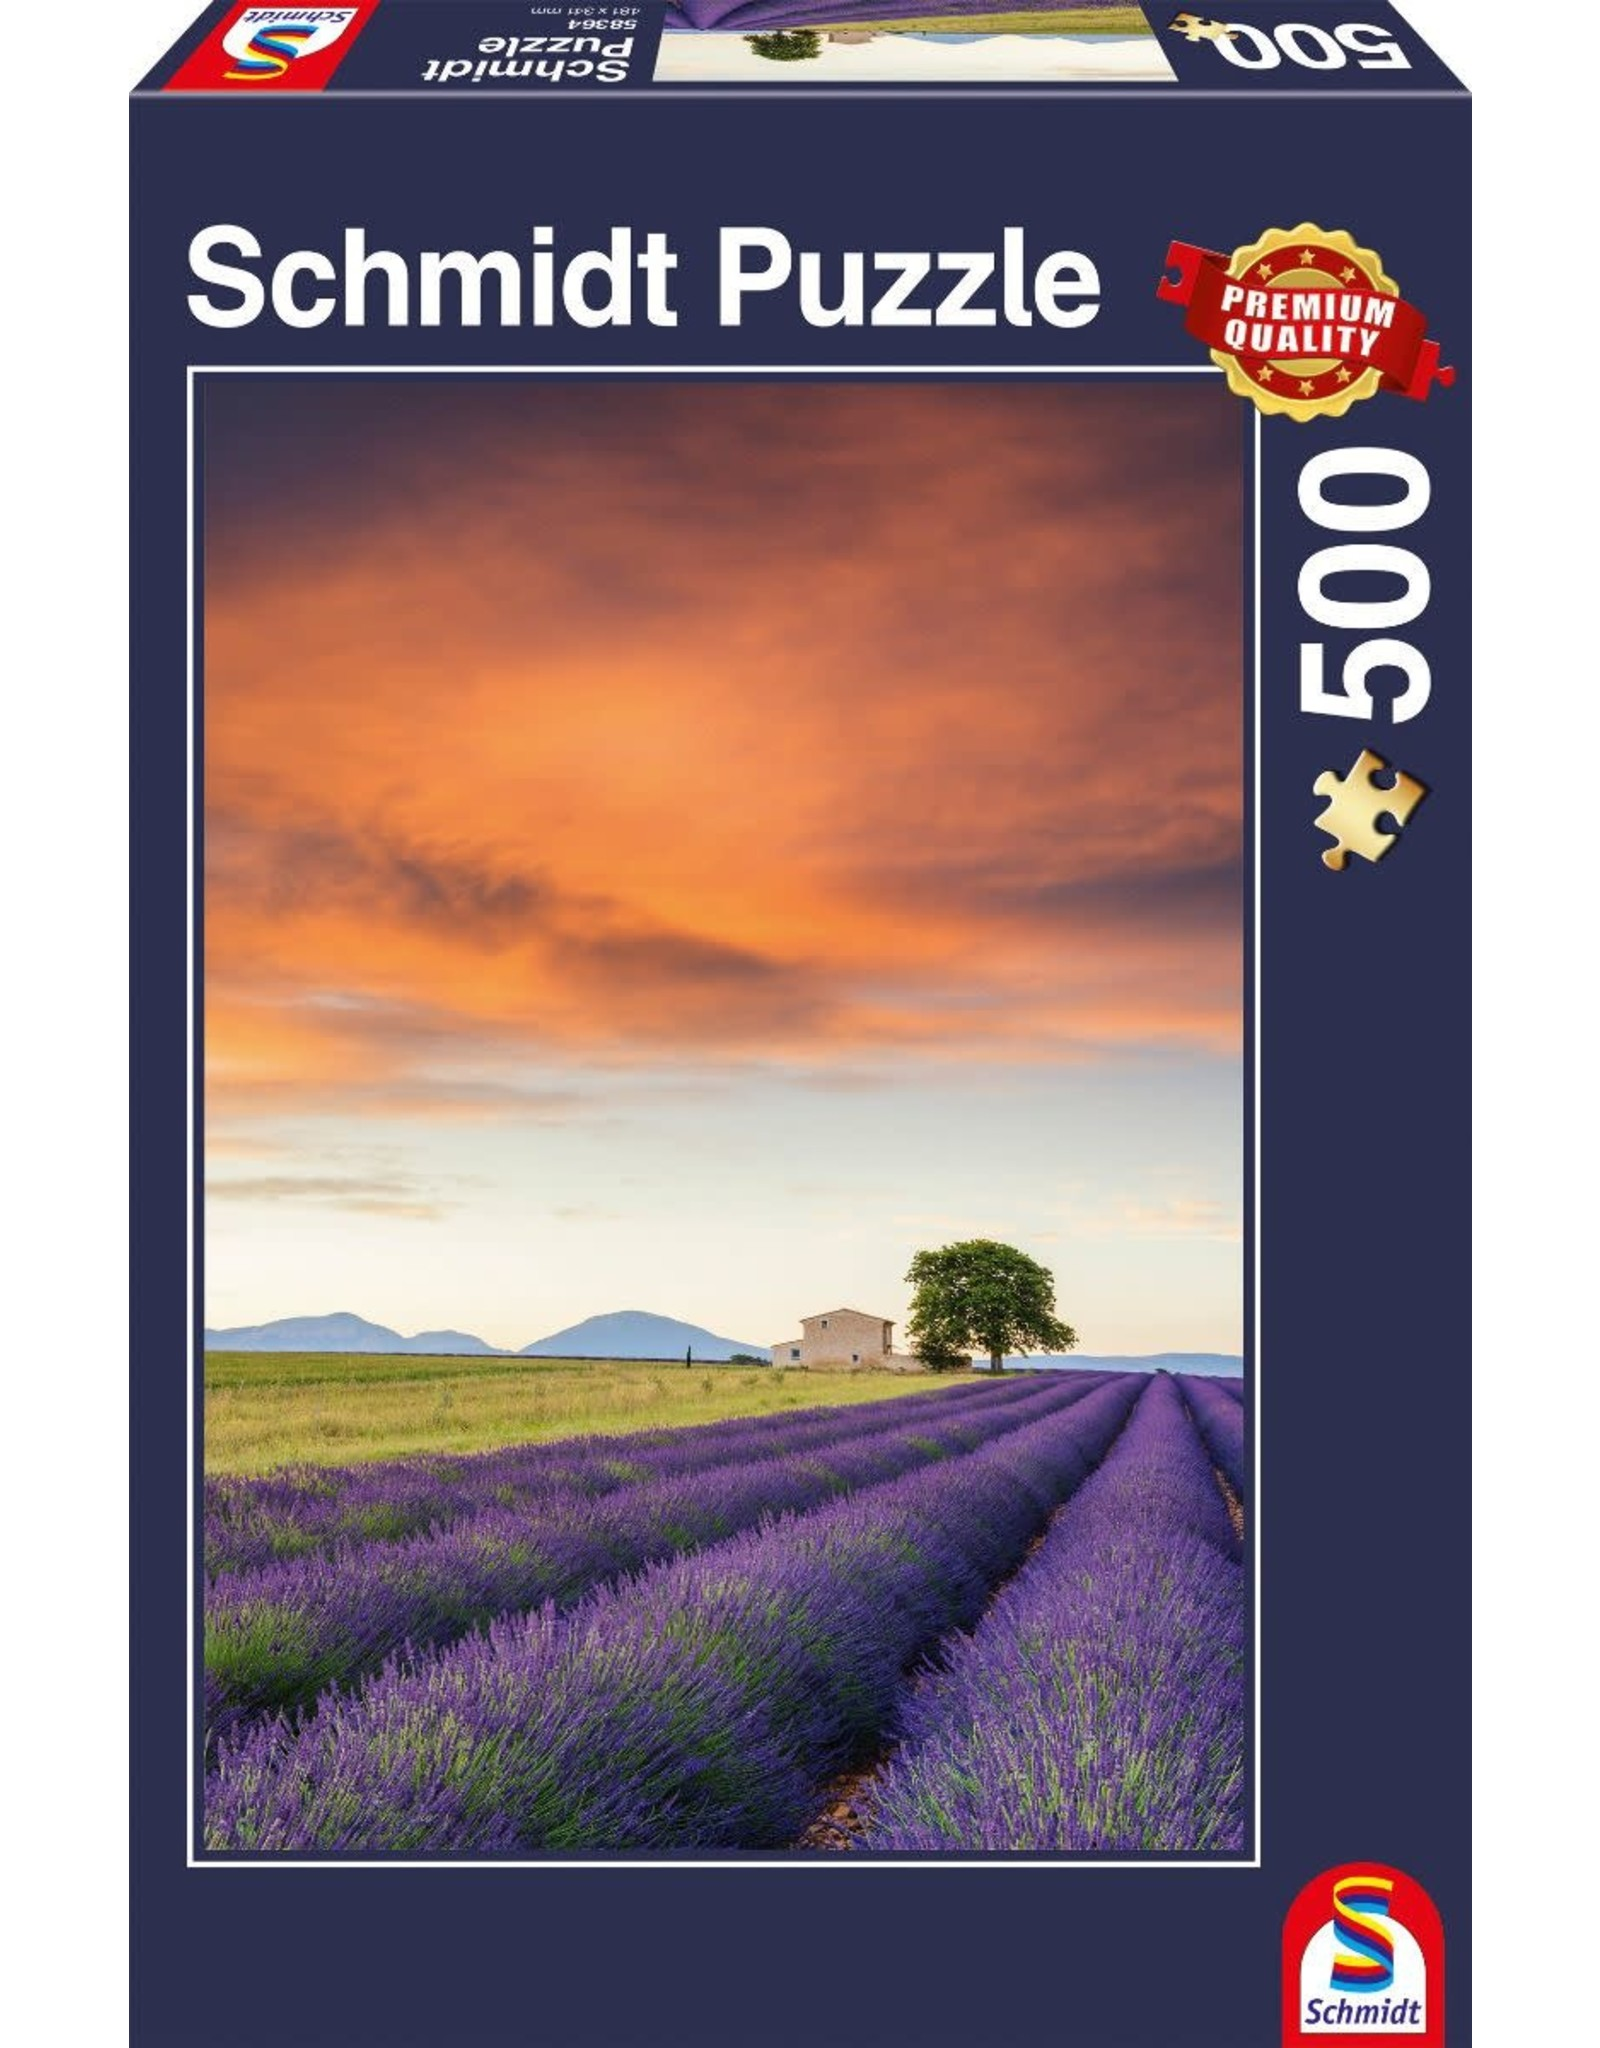 Schmidt Field of Lavender, Provence 500pc Puzzle